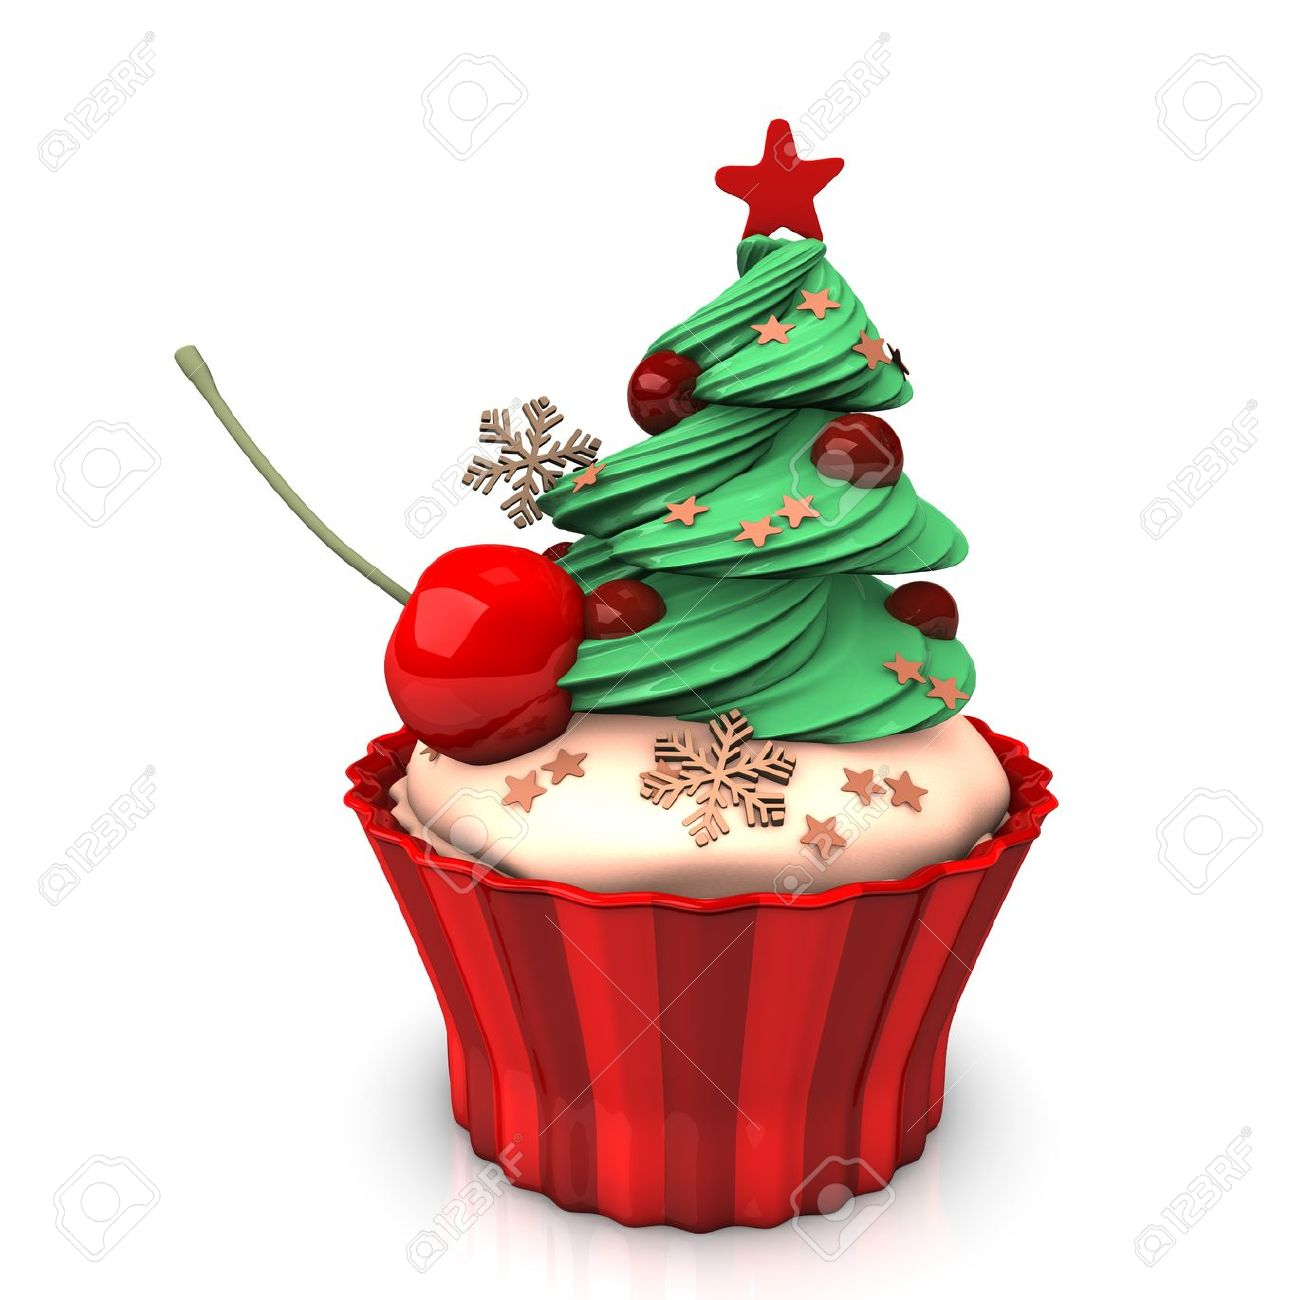 1300x1300 Happy Birthday Cupcake Purple. Kara's Party Ideas Ice Cream Parlor